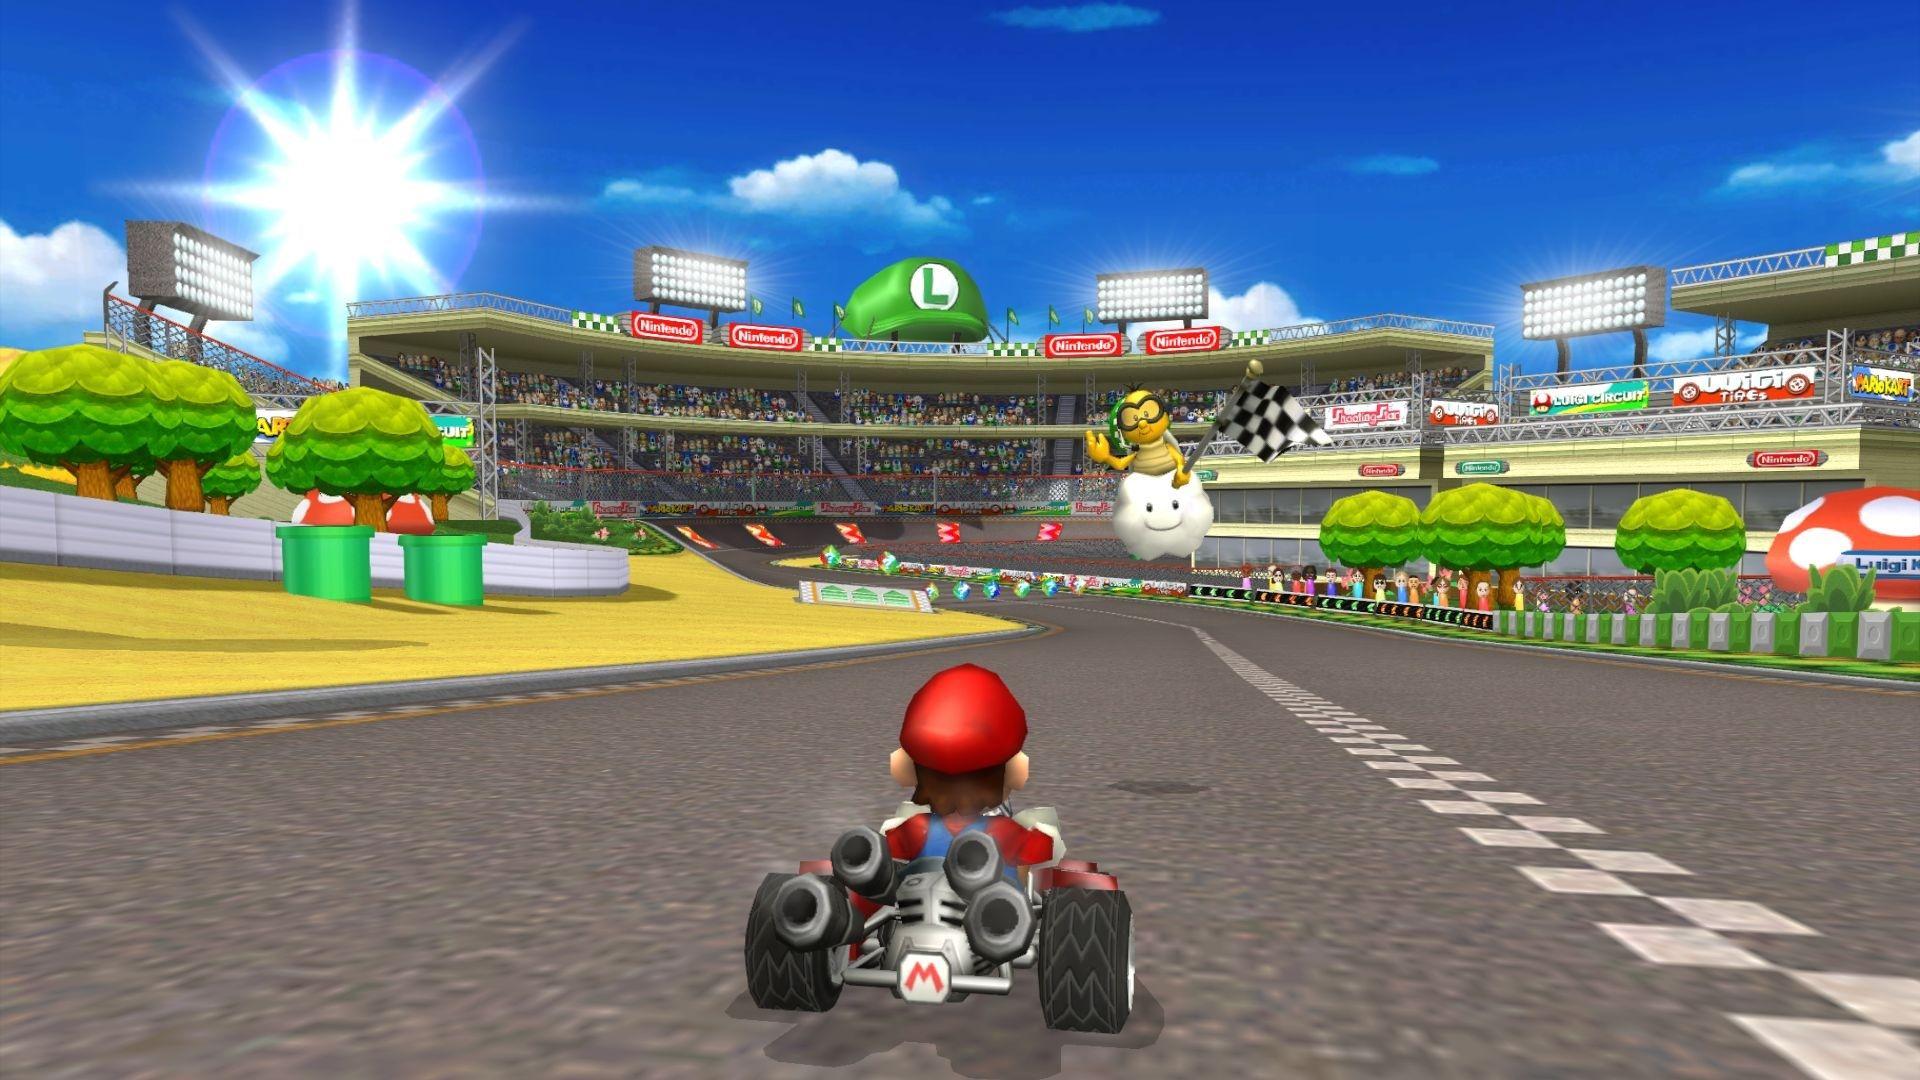 1920x1080 Px Hd Widescreen Wallpapers Mario Kart Wii Image By Branton Bush For Pocketfullofgrace Com Mario Kart Wii Mario Kart Dolphin Emulator